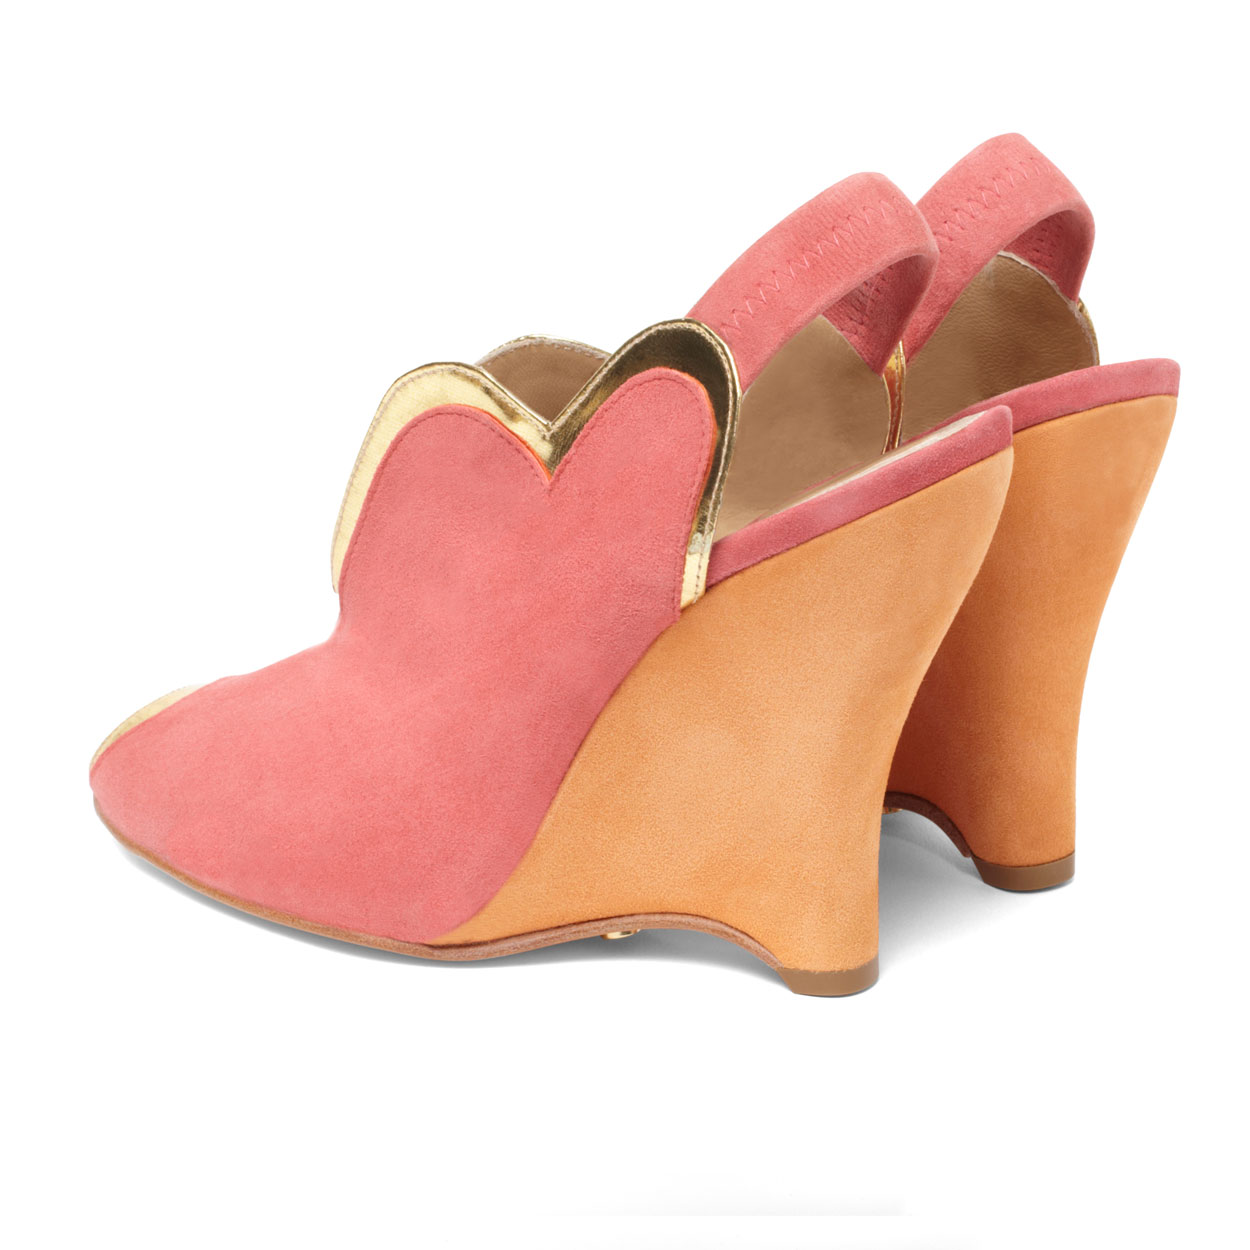 bubble-pink-pair-back-shoes-shoe-designer-london-cleob-heels.jpg